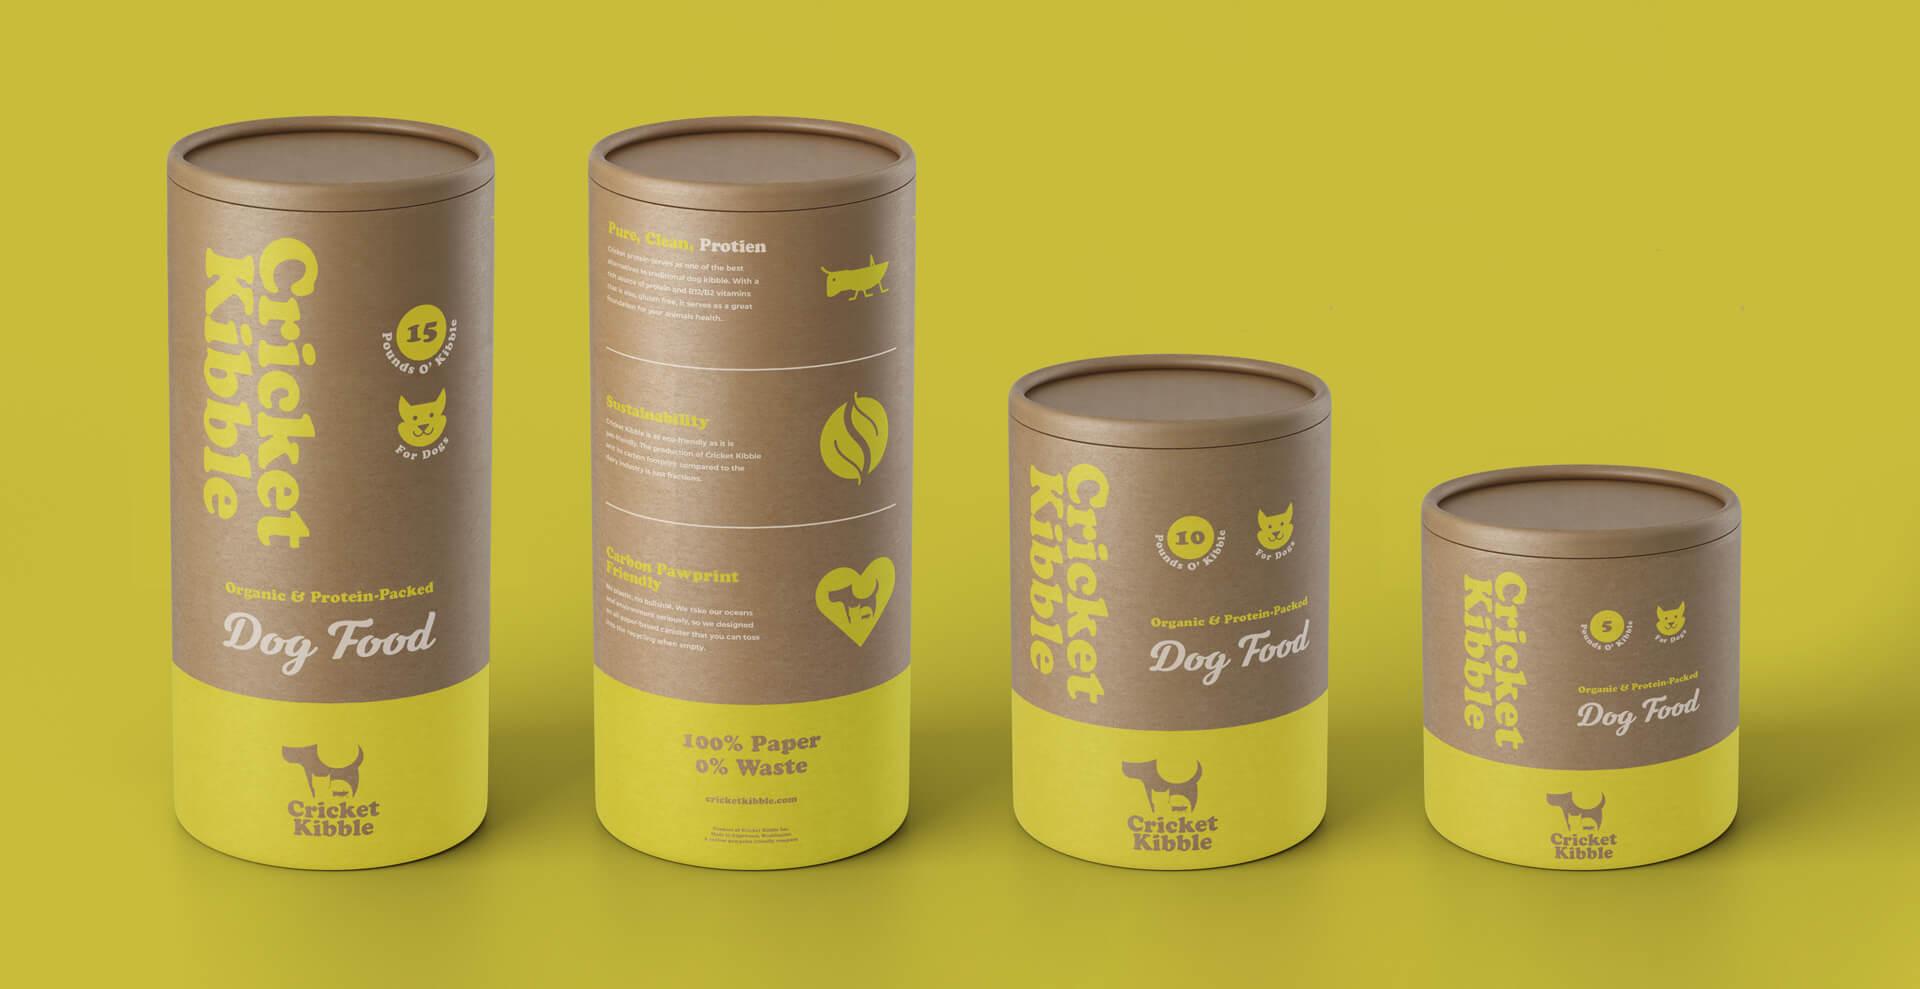 Cricket Kibble full line of tube packaging design dog food